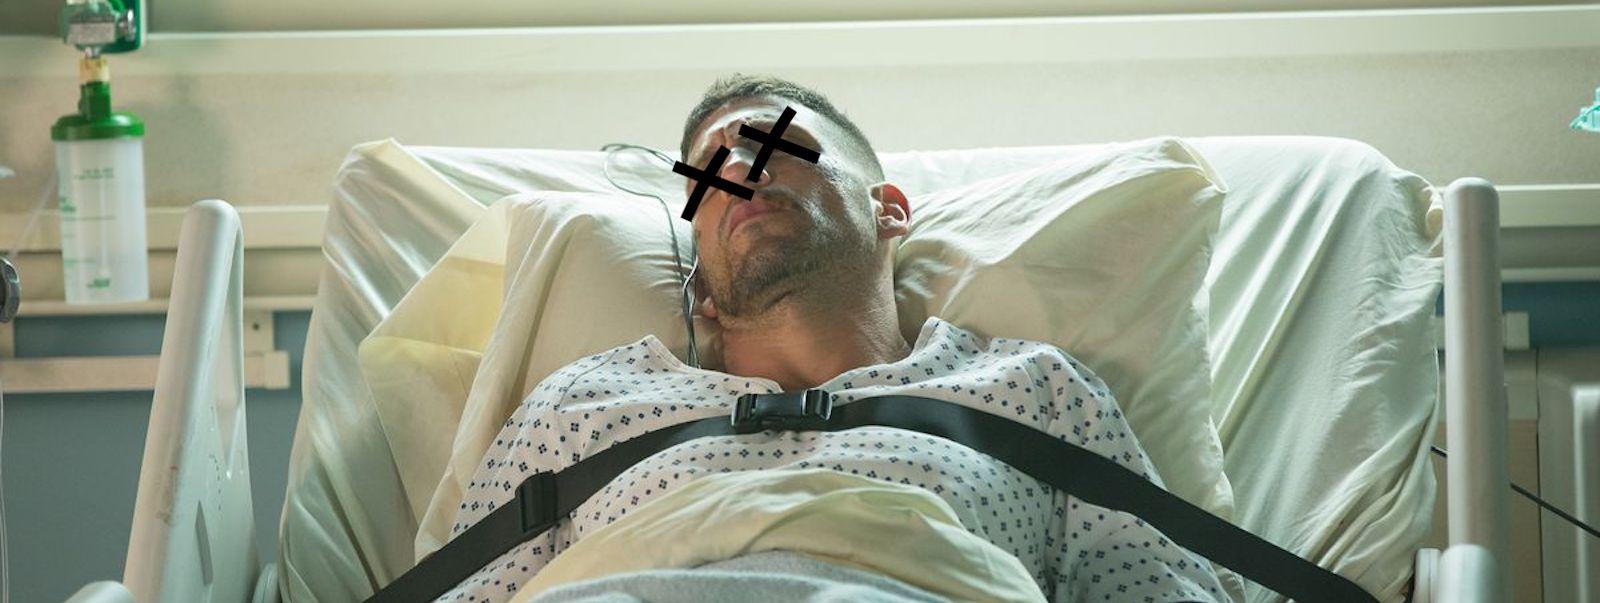 Punisher in hospital